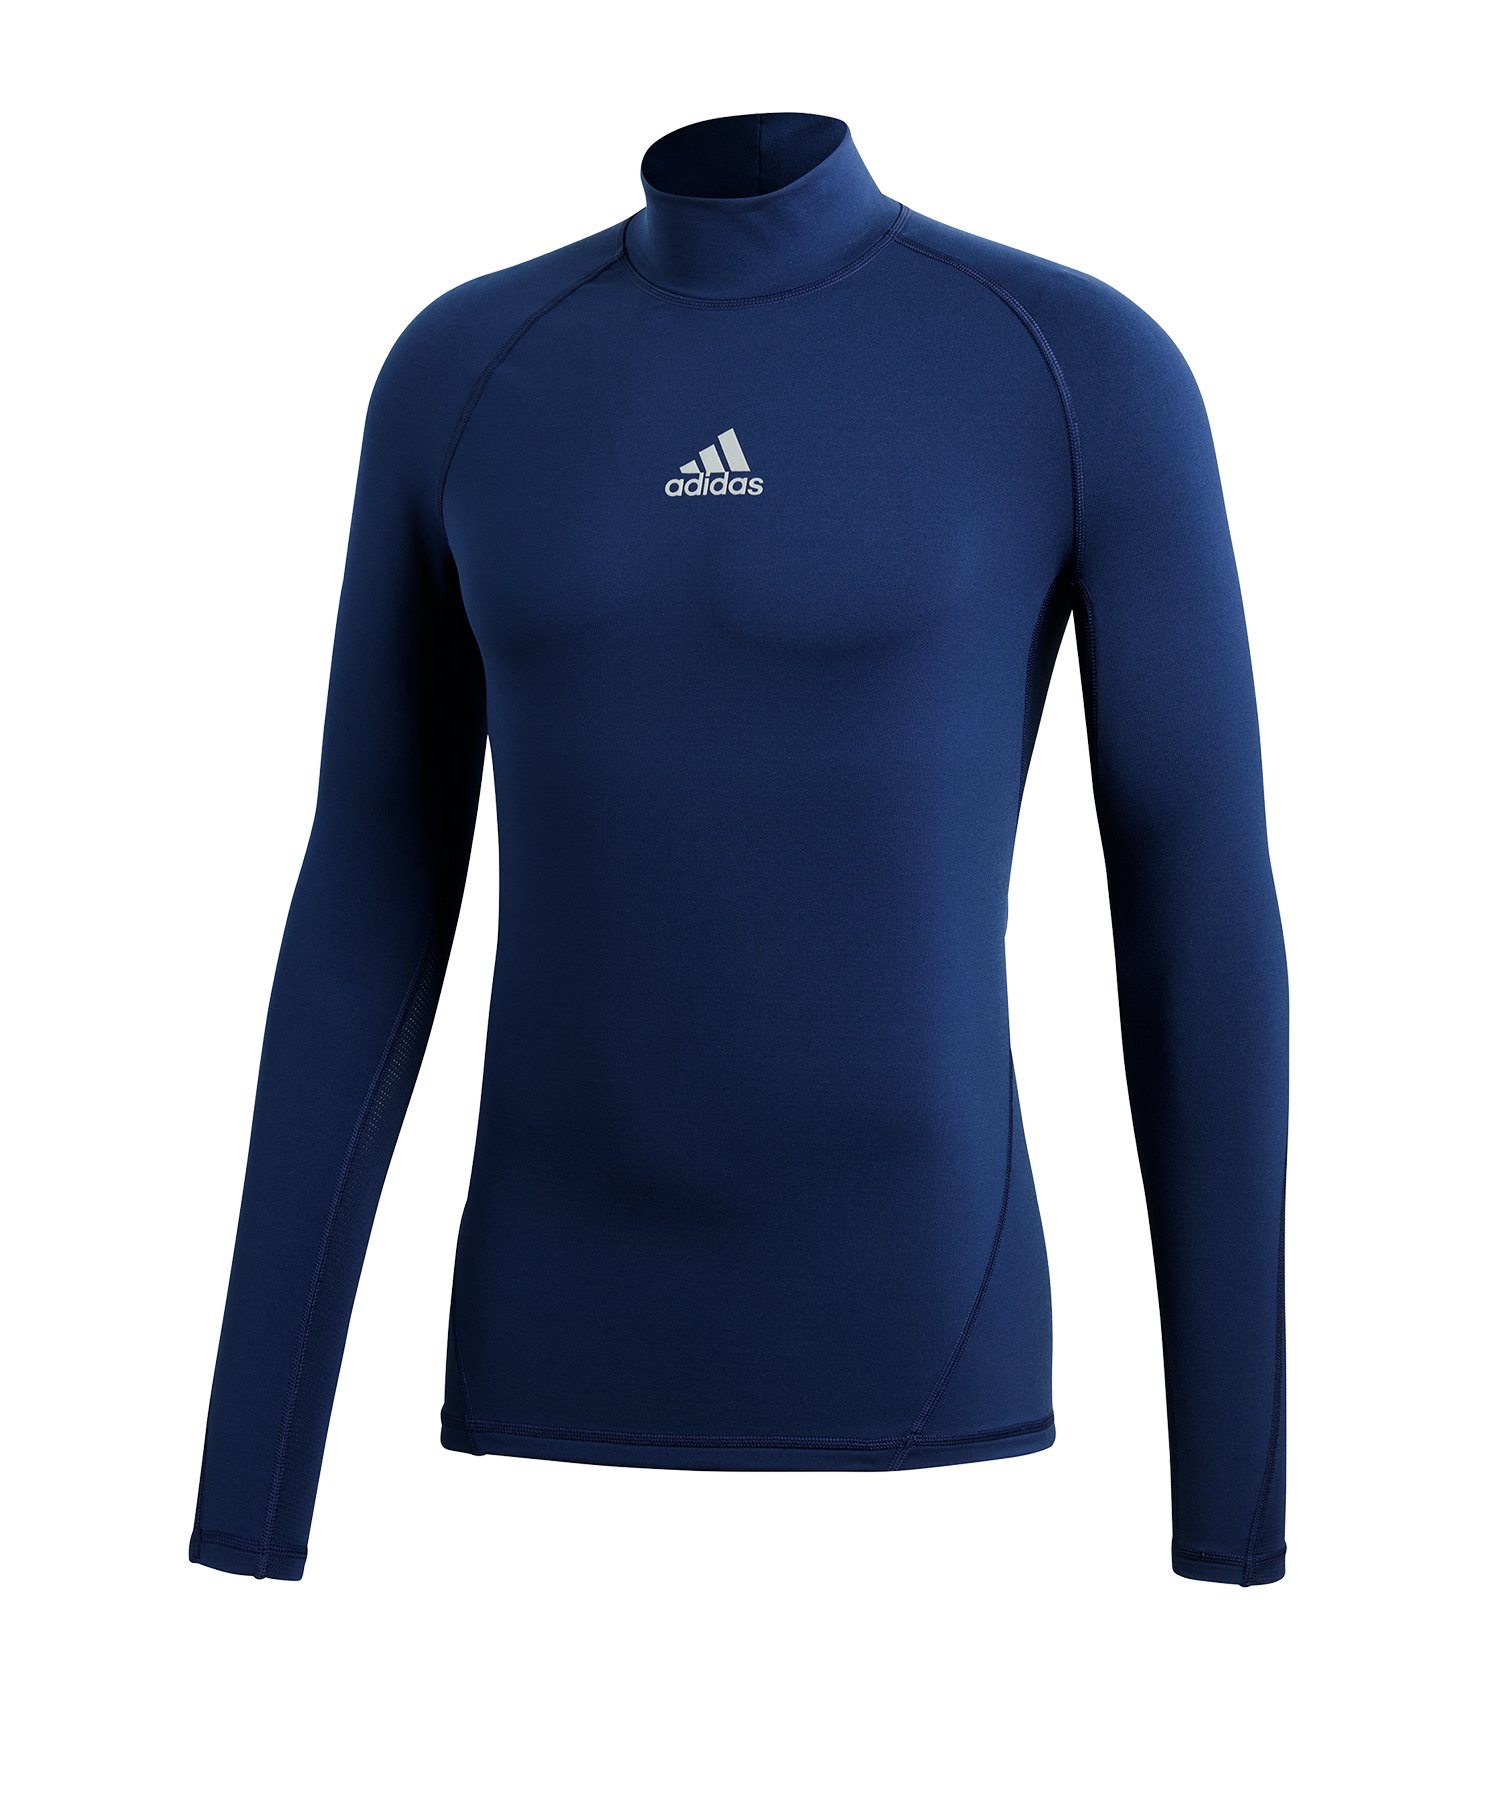 adidas Alphaskin Mock Warm langarm Dunkelblau - blau